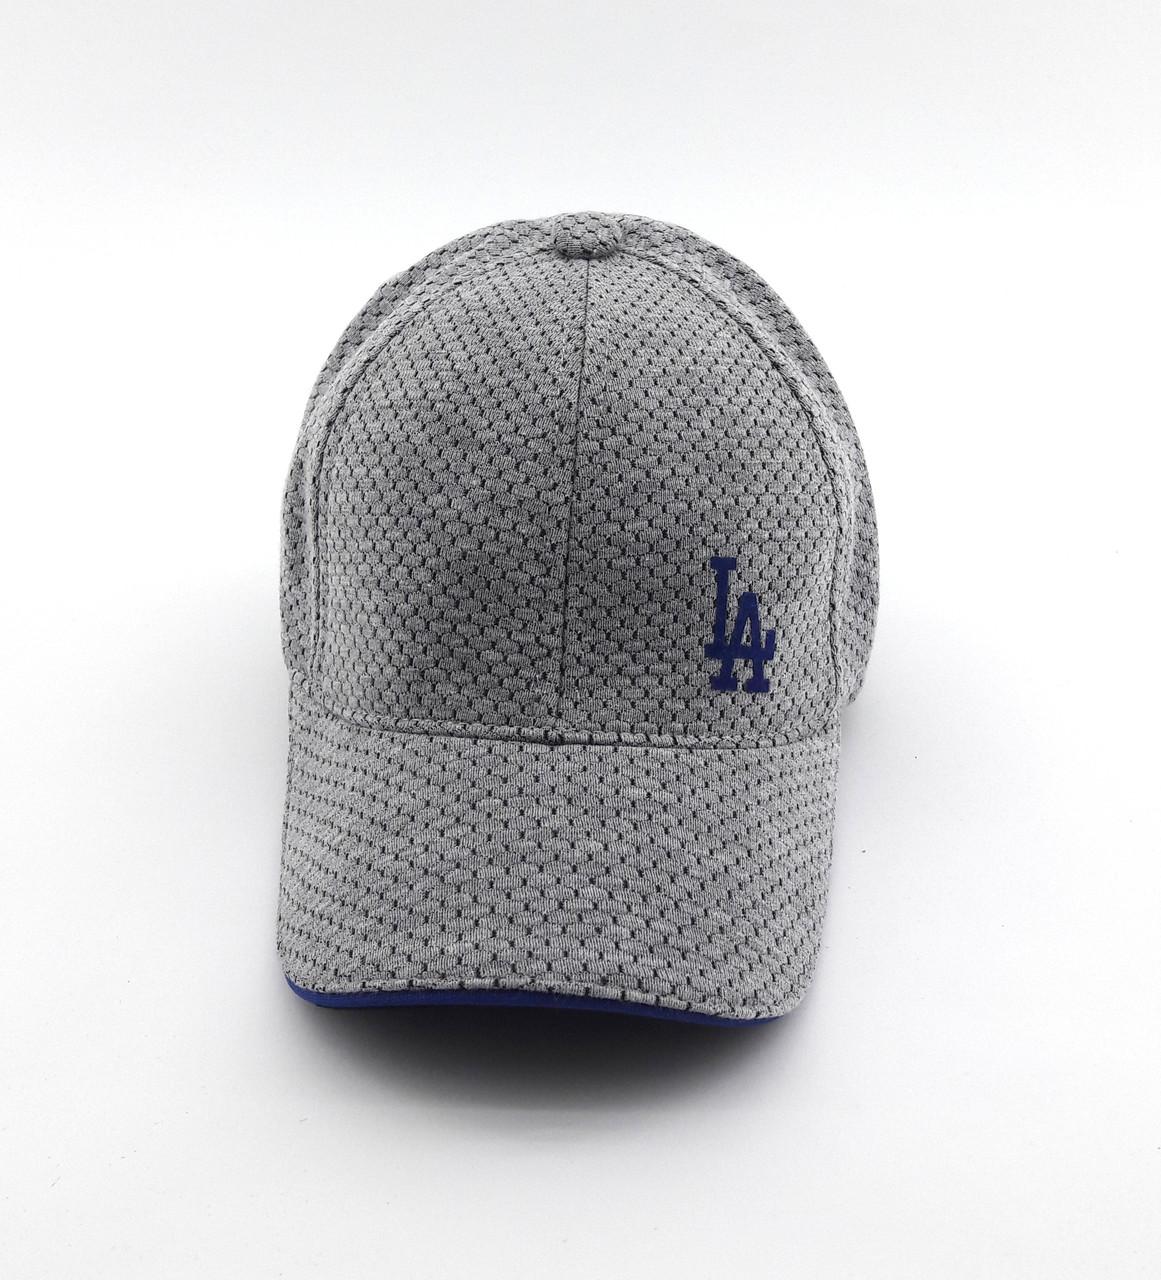 Бейсболка трикотажная Los Angeles 54-58 размер мелкая  продажа f9ee9afe8a54e